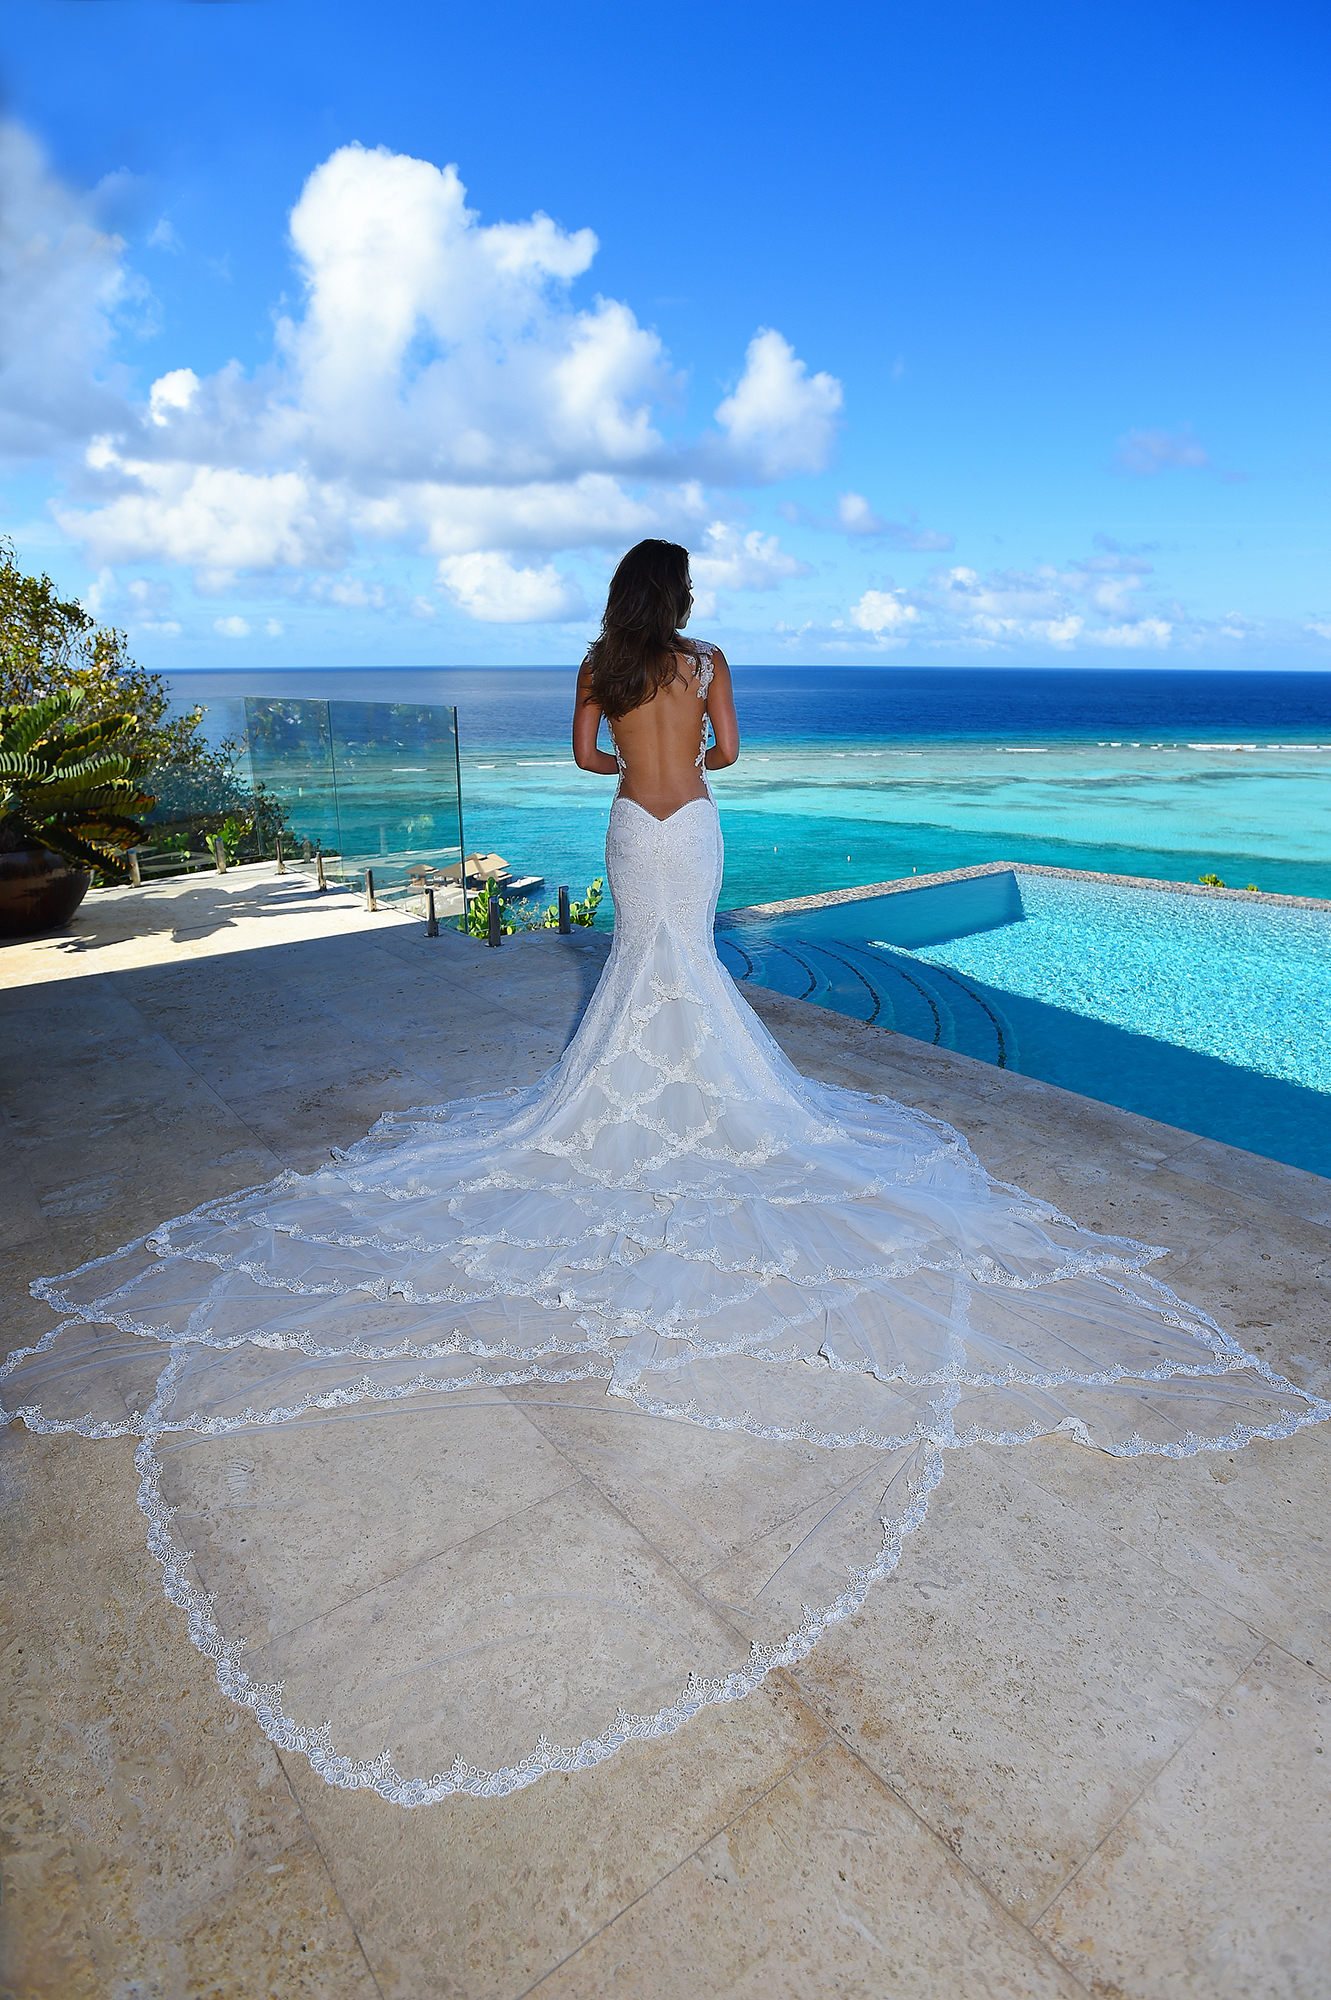 entry-29-alainbrin_blueglassphotography_dressedforparadise.jpg